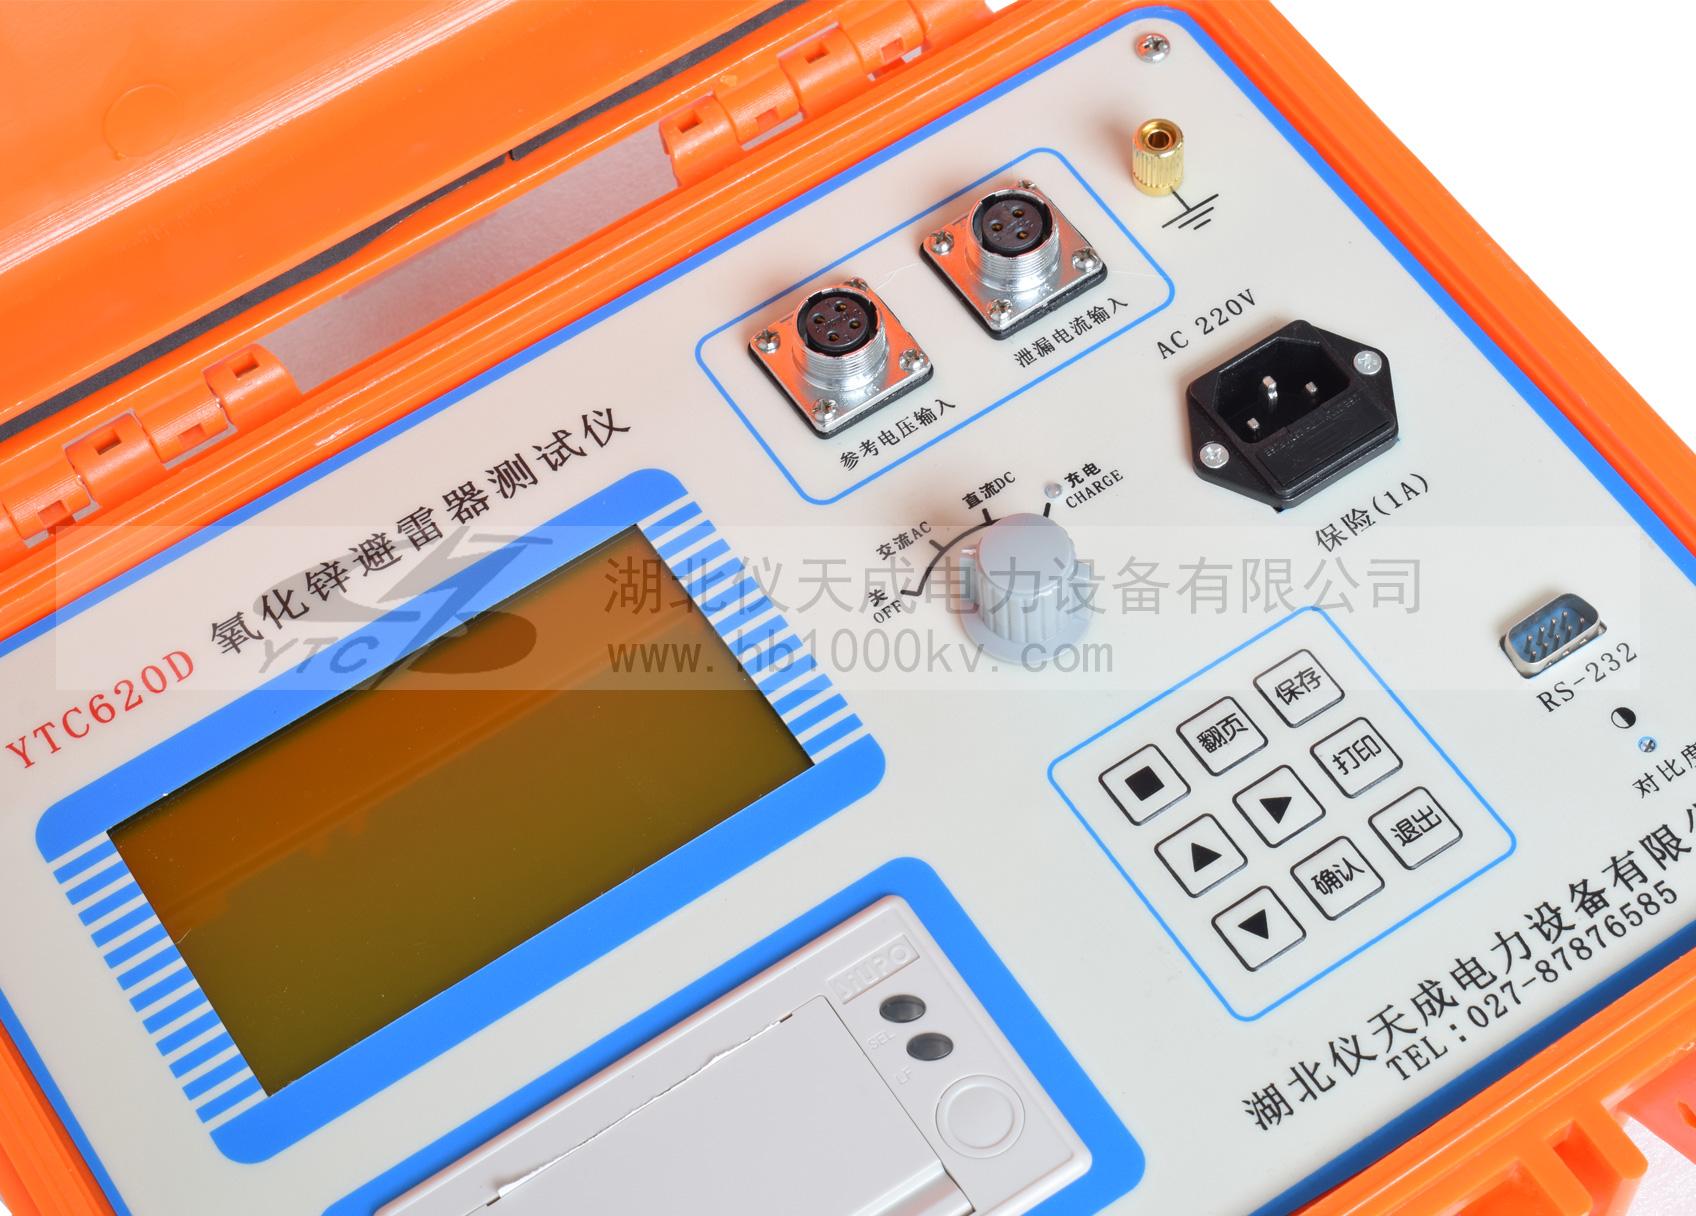 YTC620D氧化锌bilei器测试yimianban图